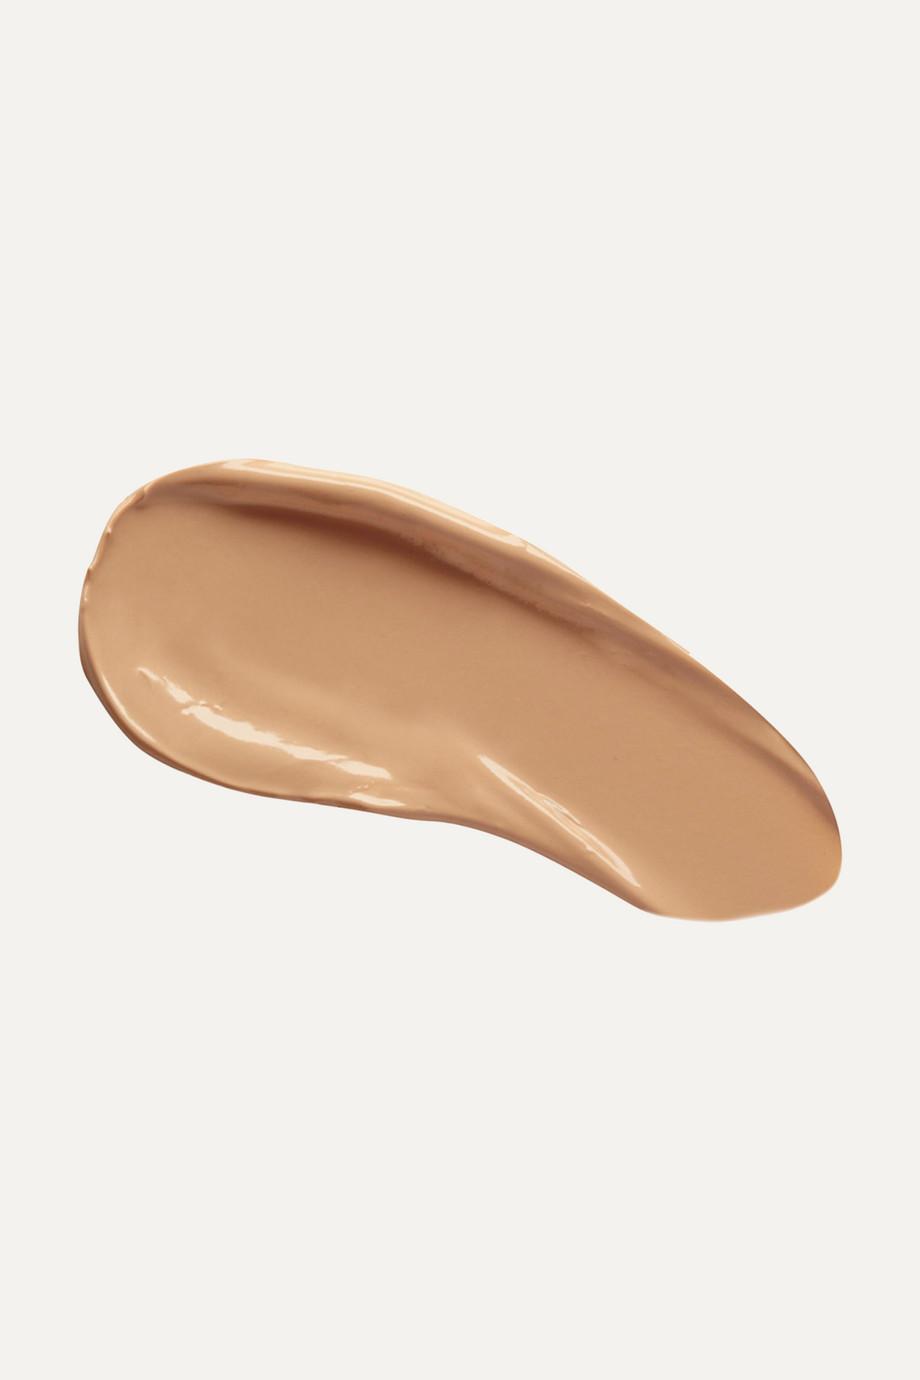 Chantecaille Just Skin Tinted Moisturizer SPF15 - Glow, 50ml